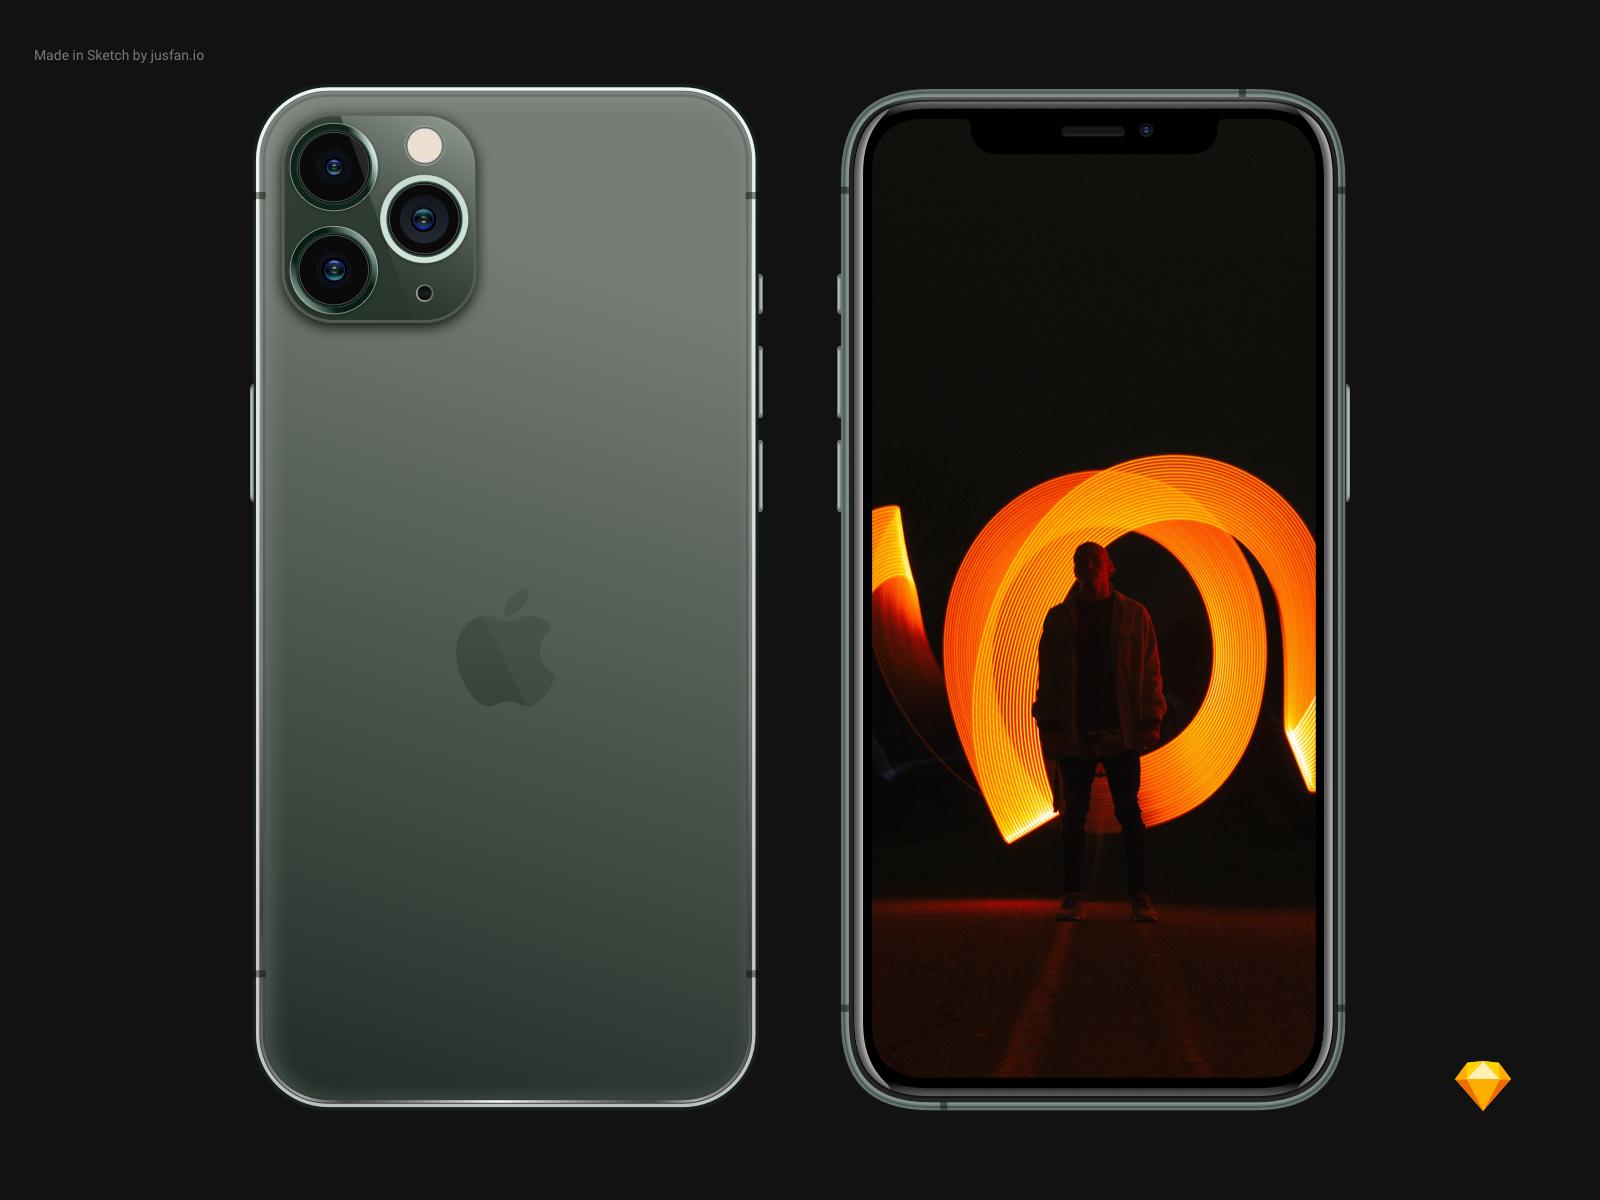 Freebie iPhone 11 Pro Mockup - Sketch